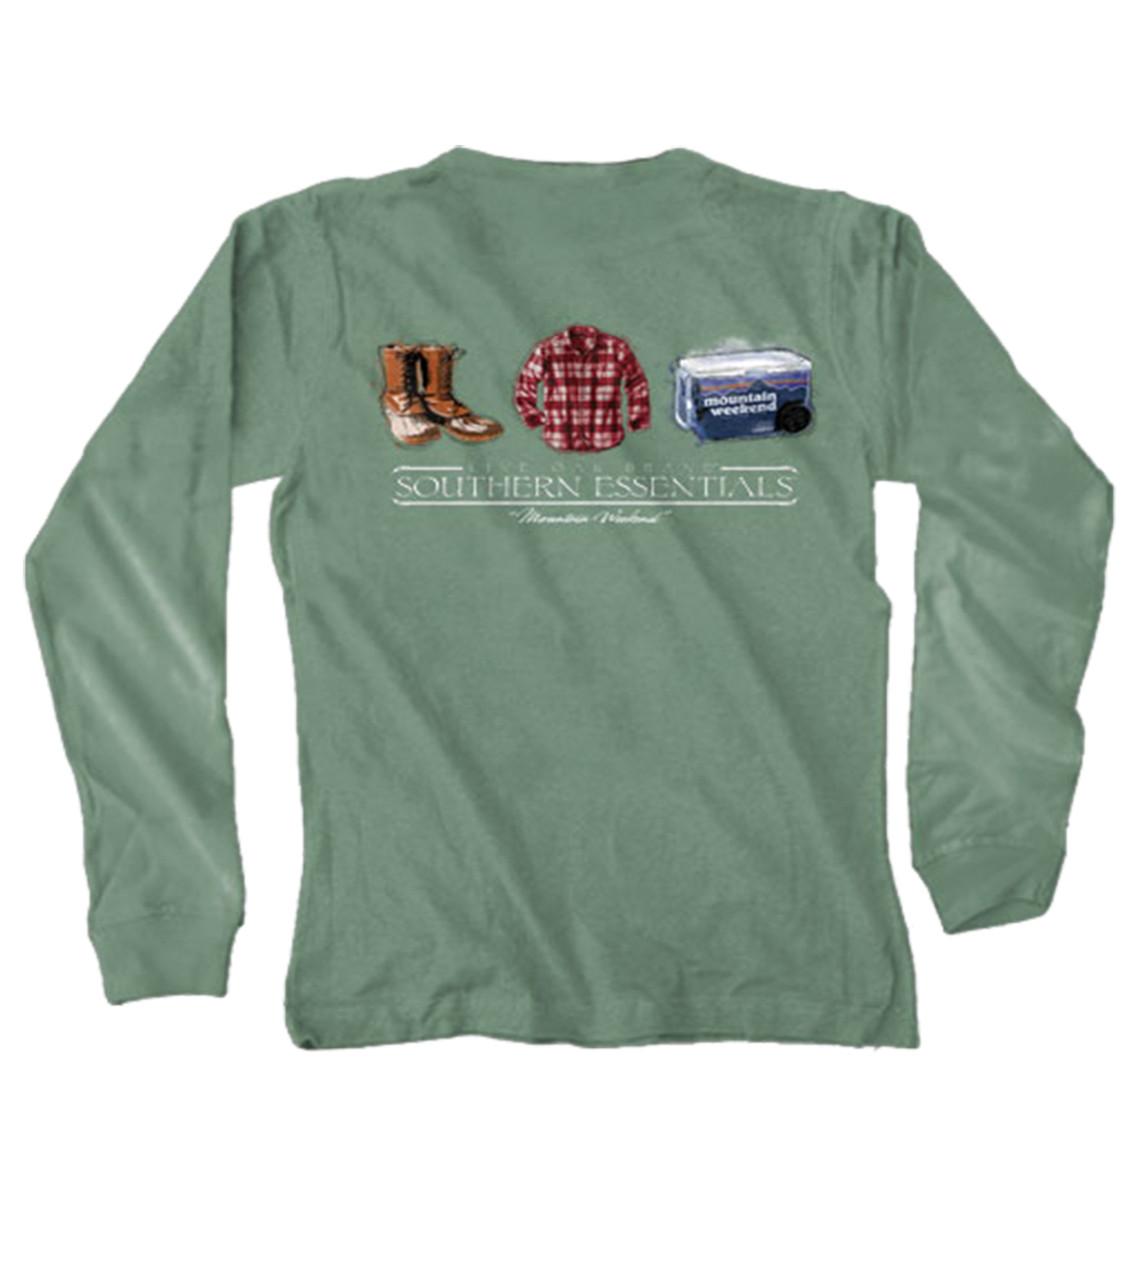 6aee46b187 Live Oak Southern Essentials Mountain Weekend Long Sleeve Tee